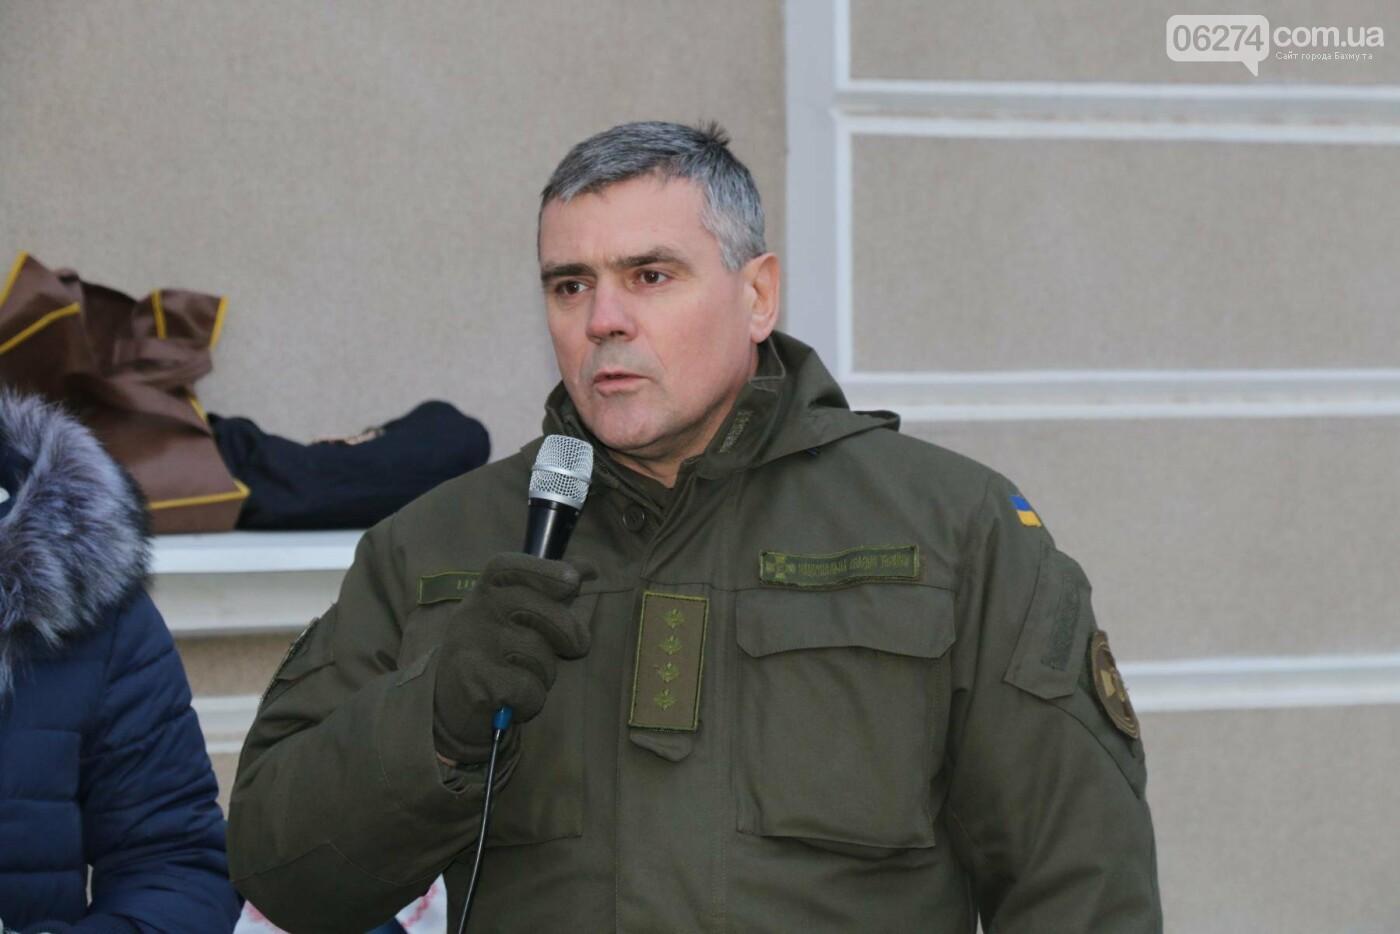 В Бахмуте прошел молебен по погибшим в Дебальцево, фото-2